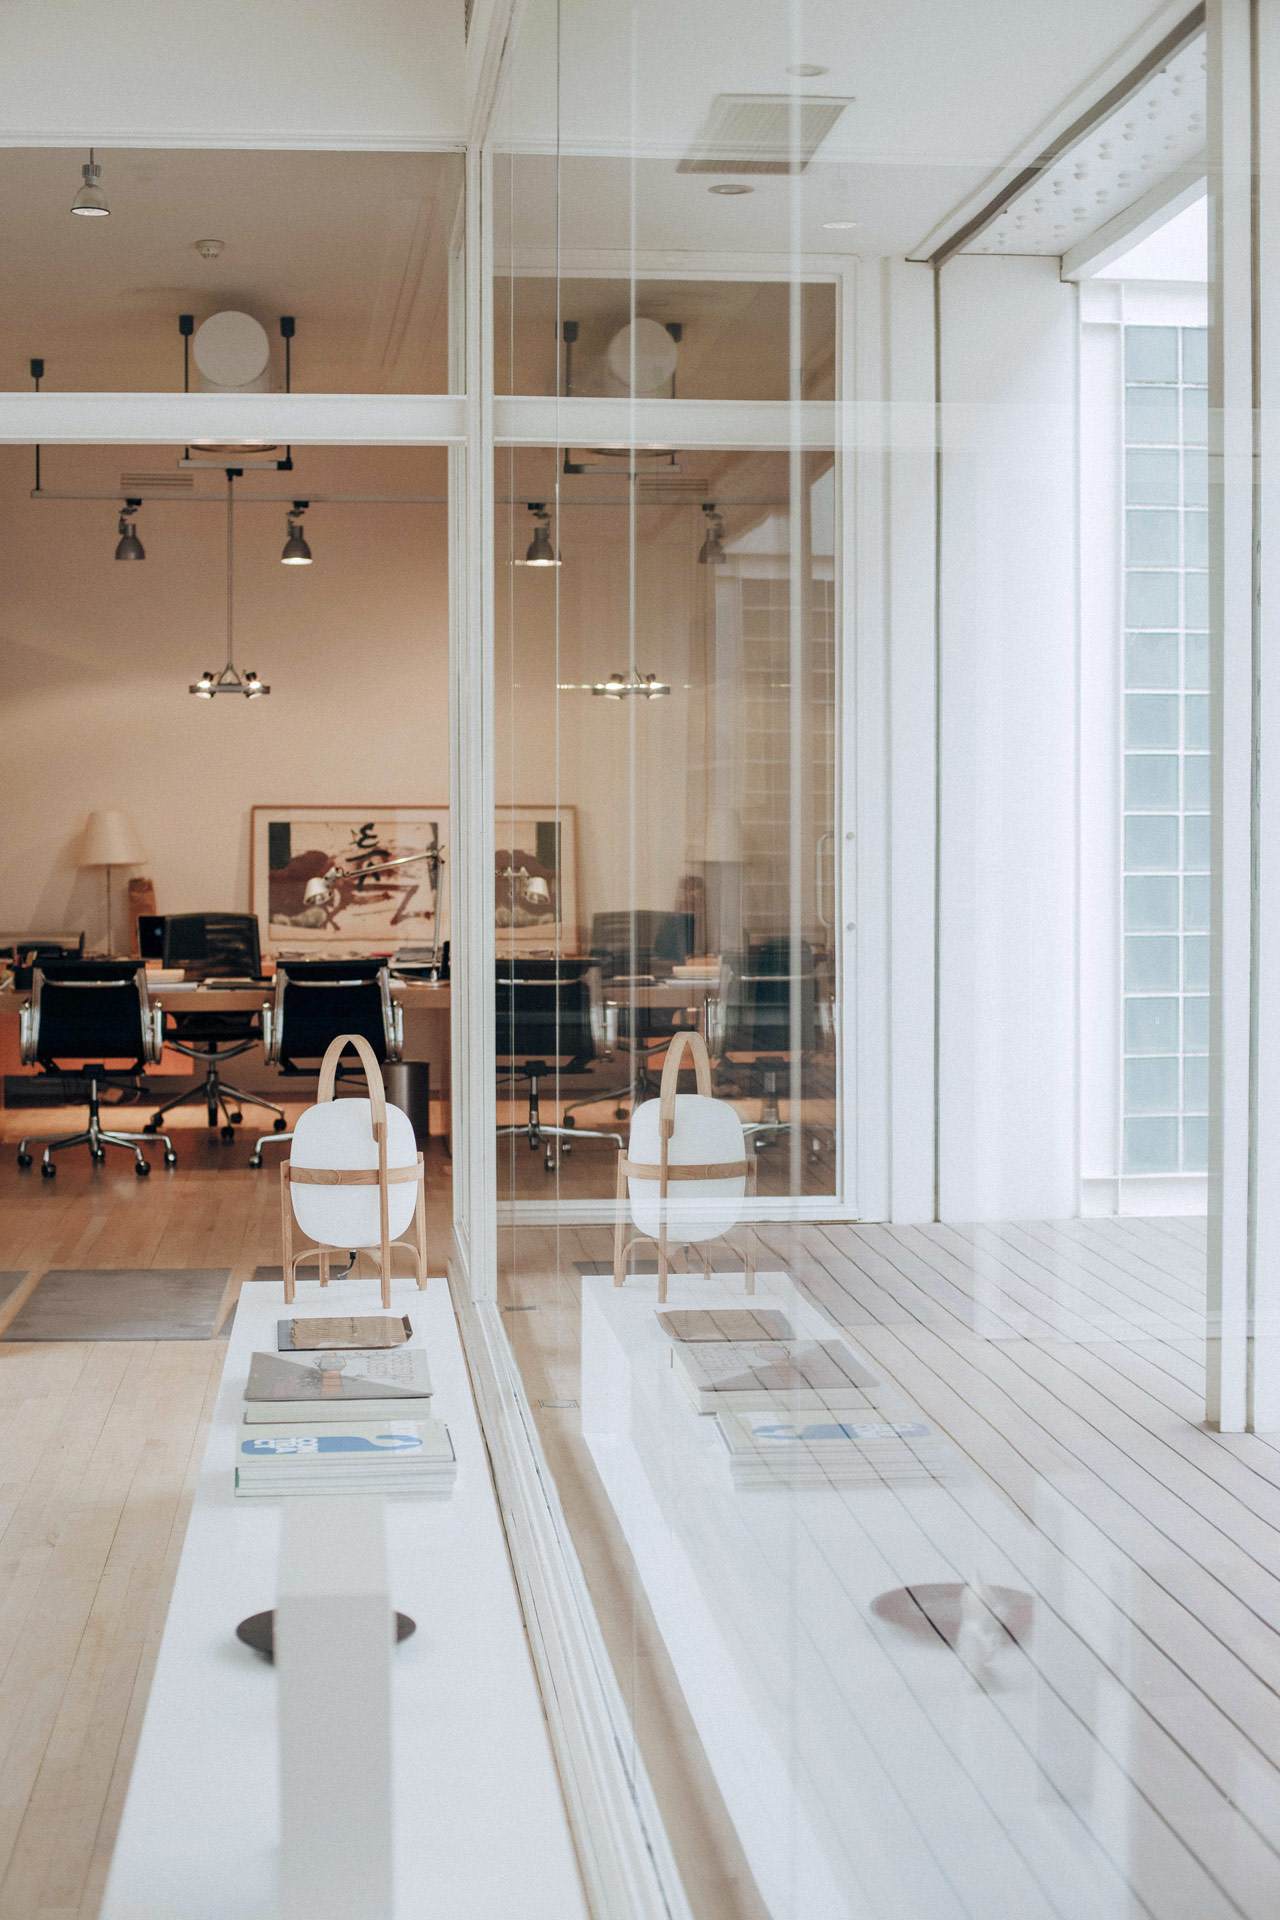 gca-architects-barcelona-andrea-navarro-golobart-luis-guillem-juan-velasco-emilio-rodriguez-entrevista-slowkind-08